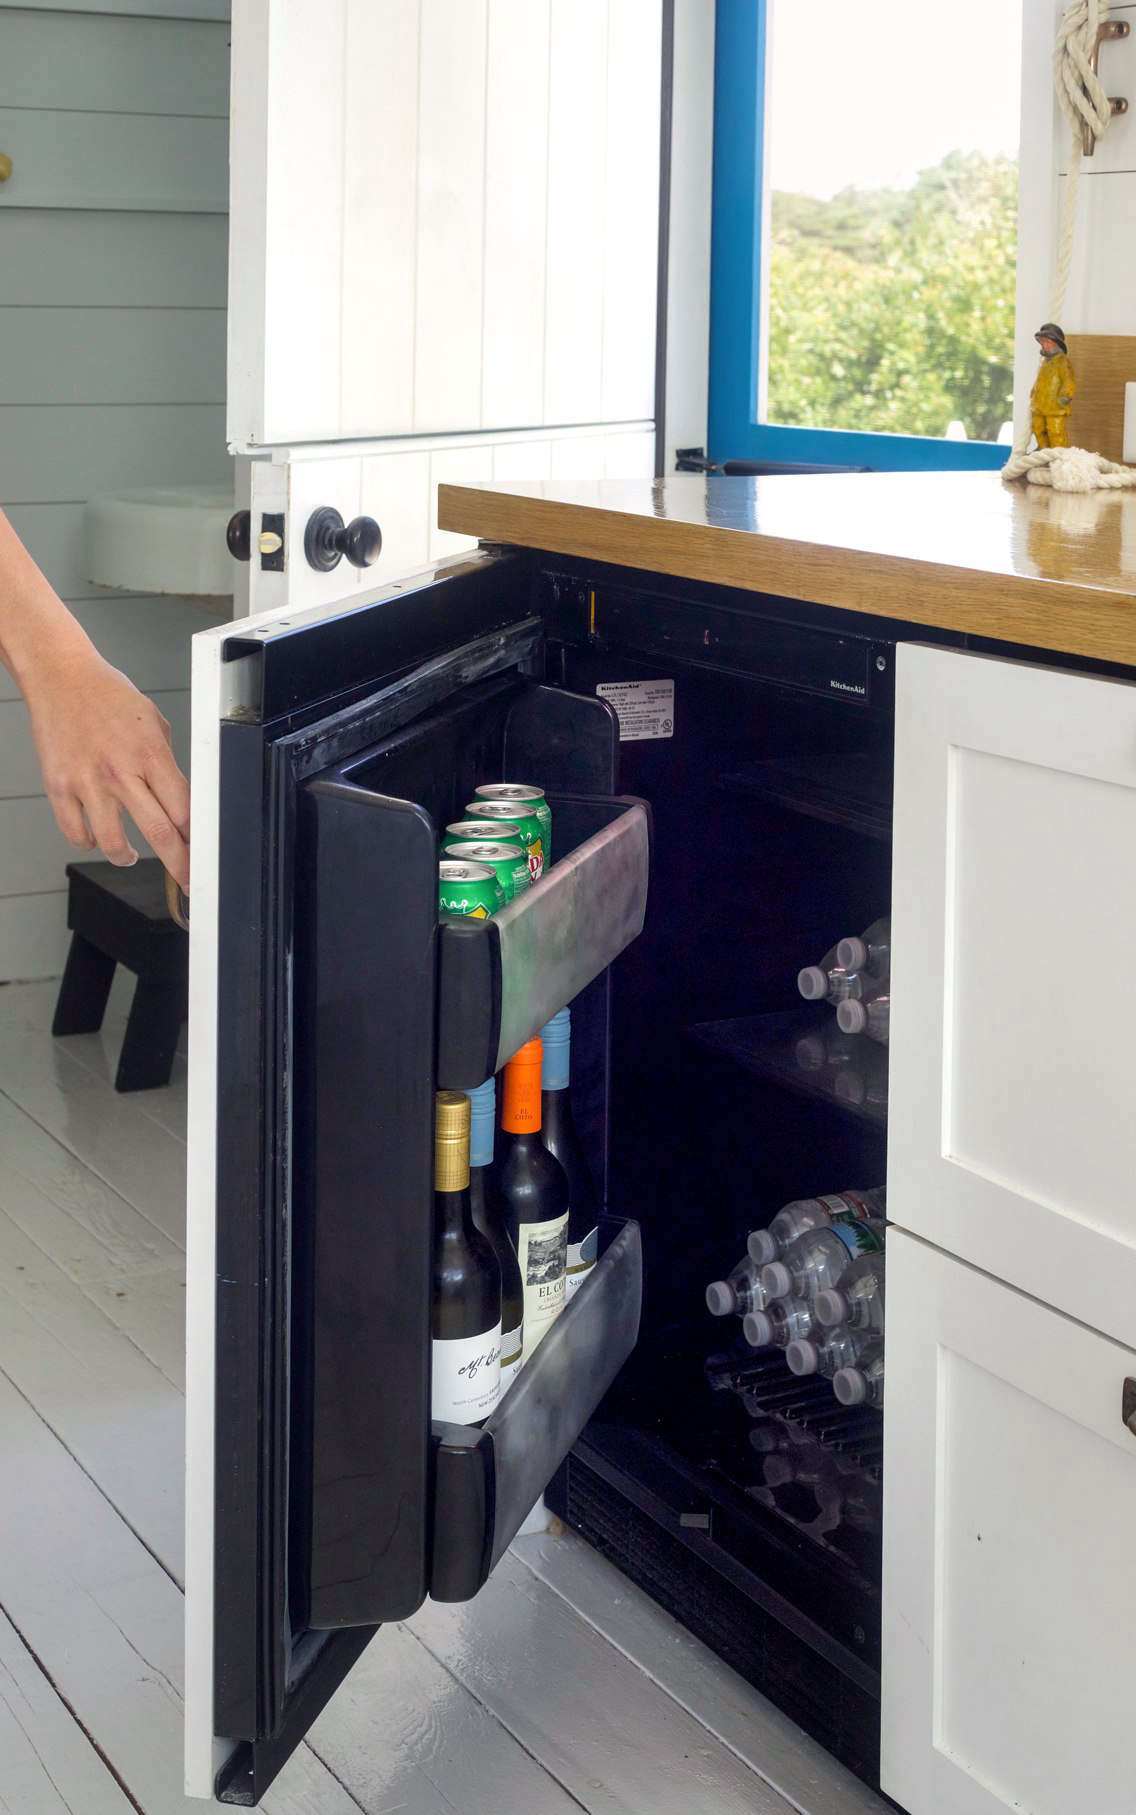 A Kitchenaid -Inch Panel Ready Undercounter Refrigerator serves as a mini drinks refrigerator.